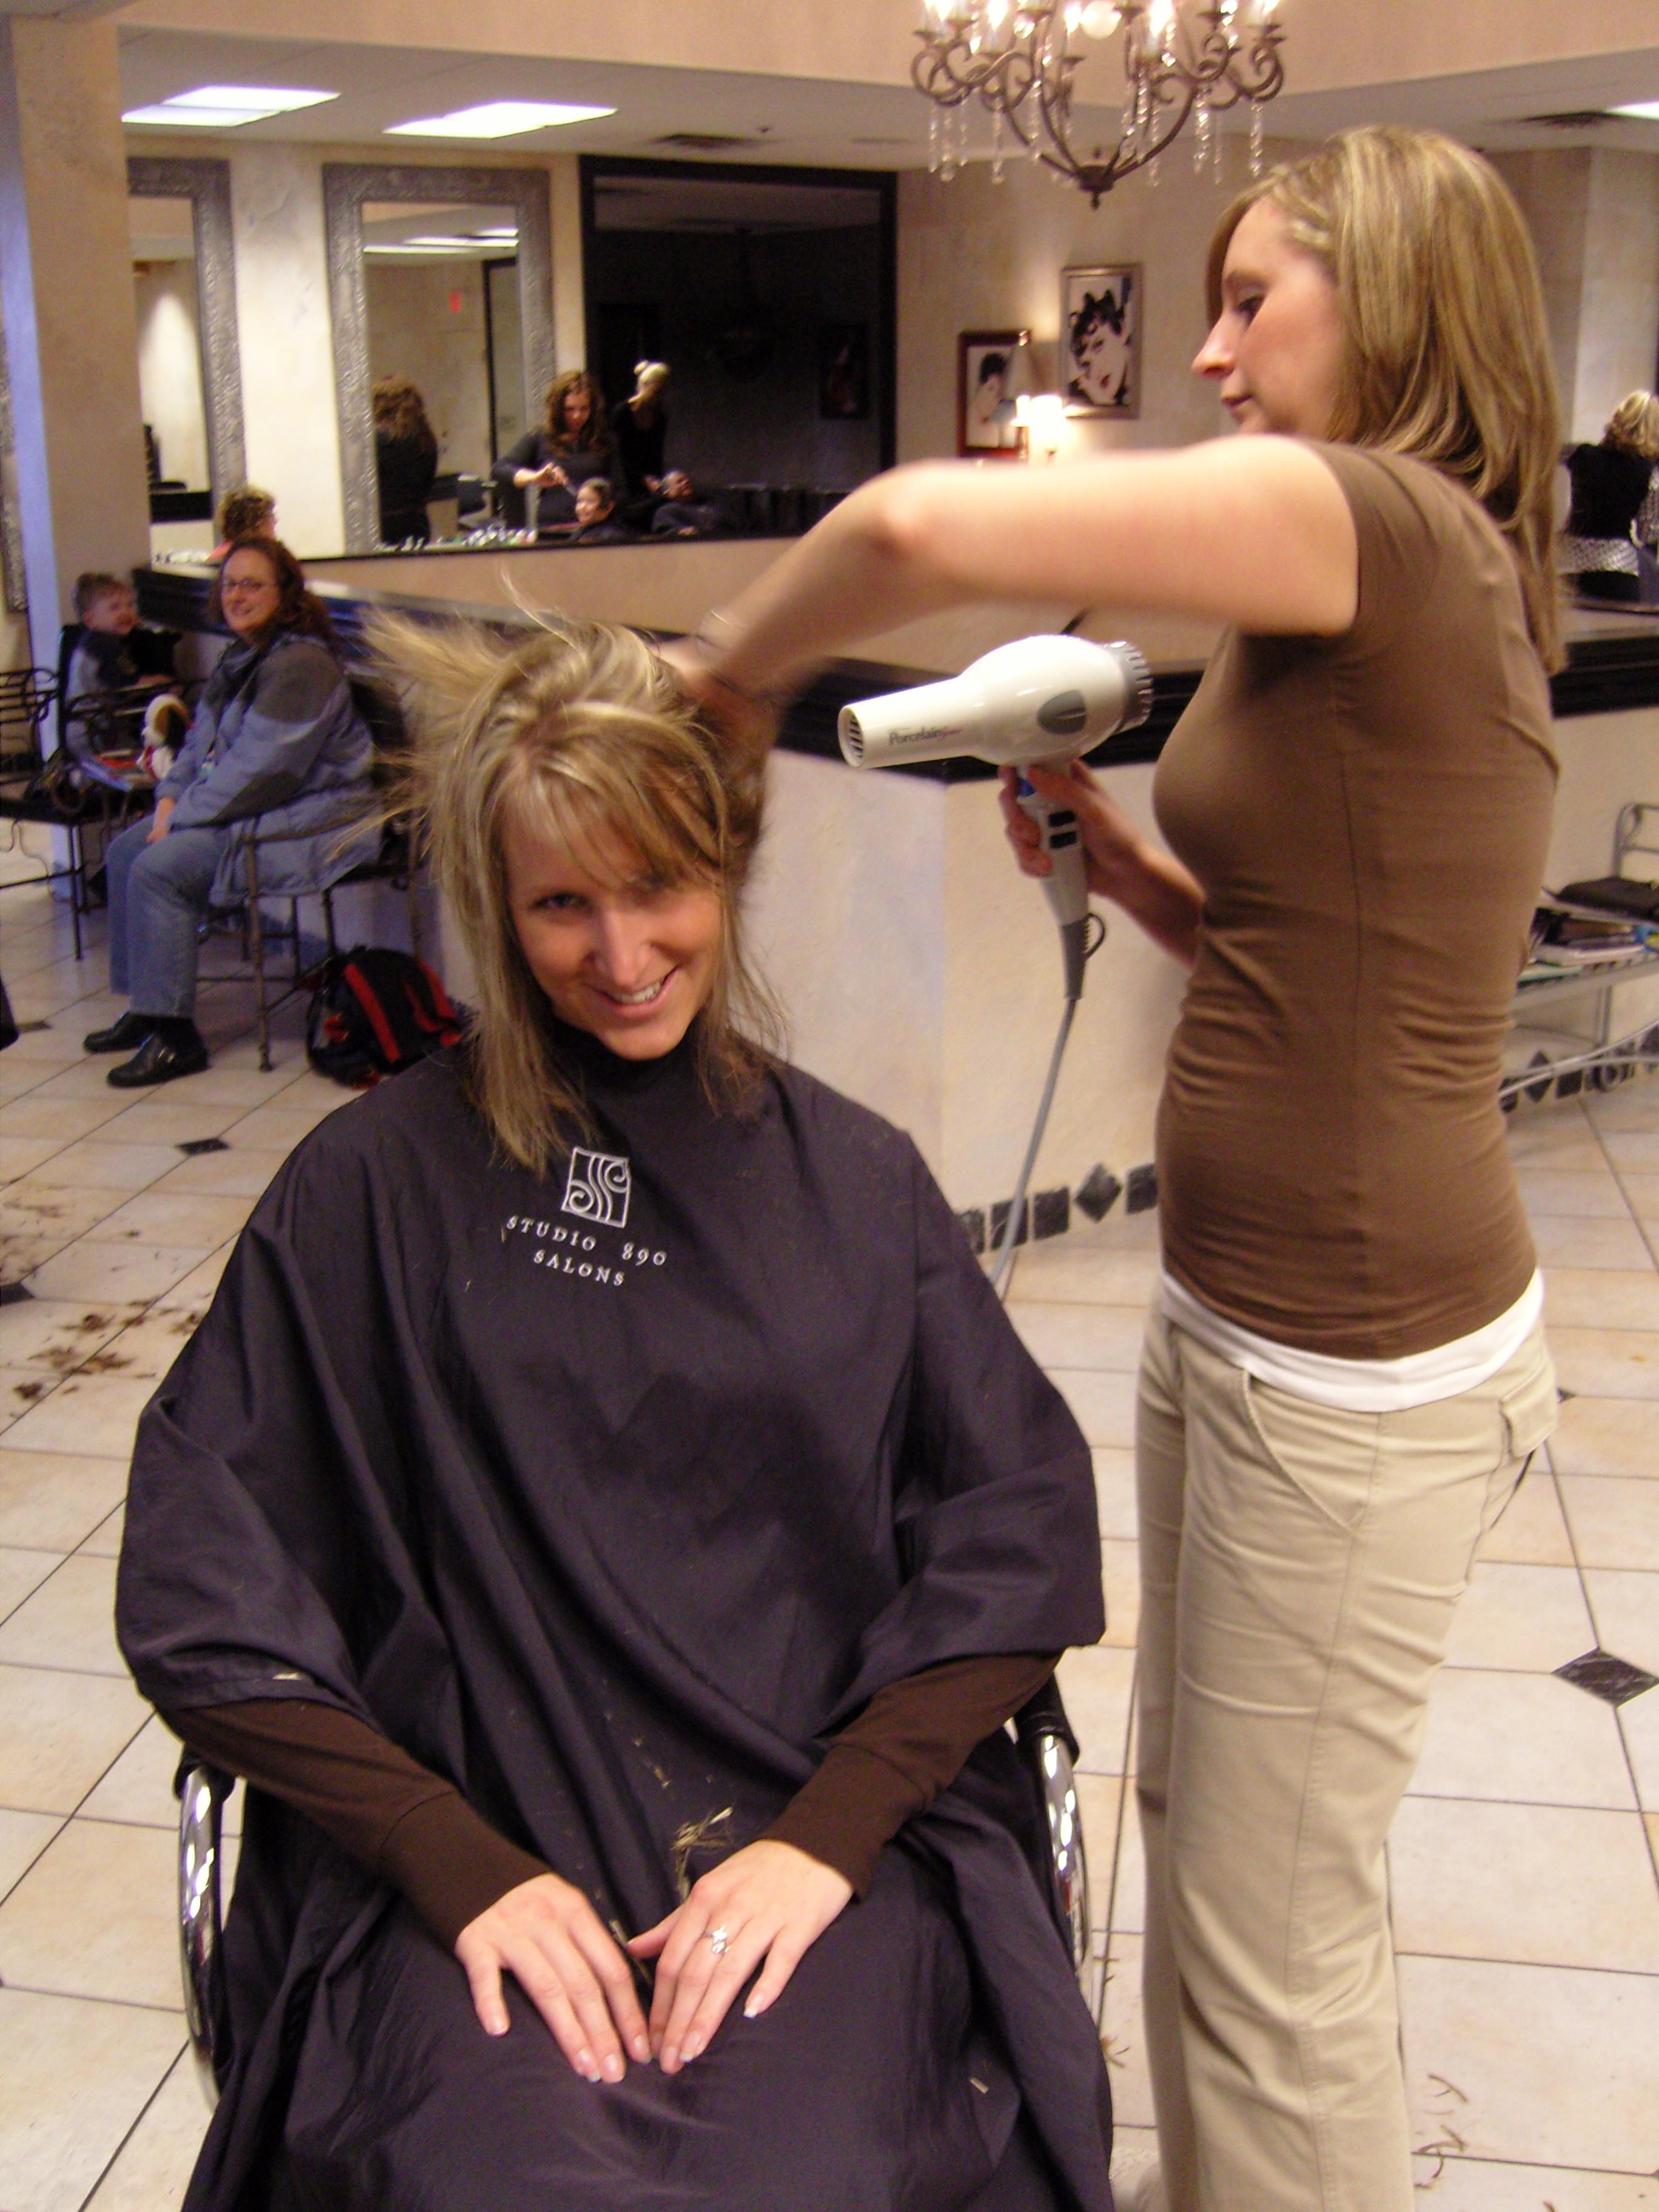 File:Drying hair in salon.jpg